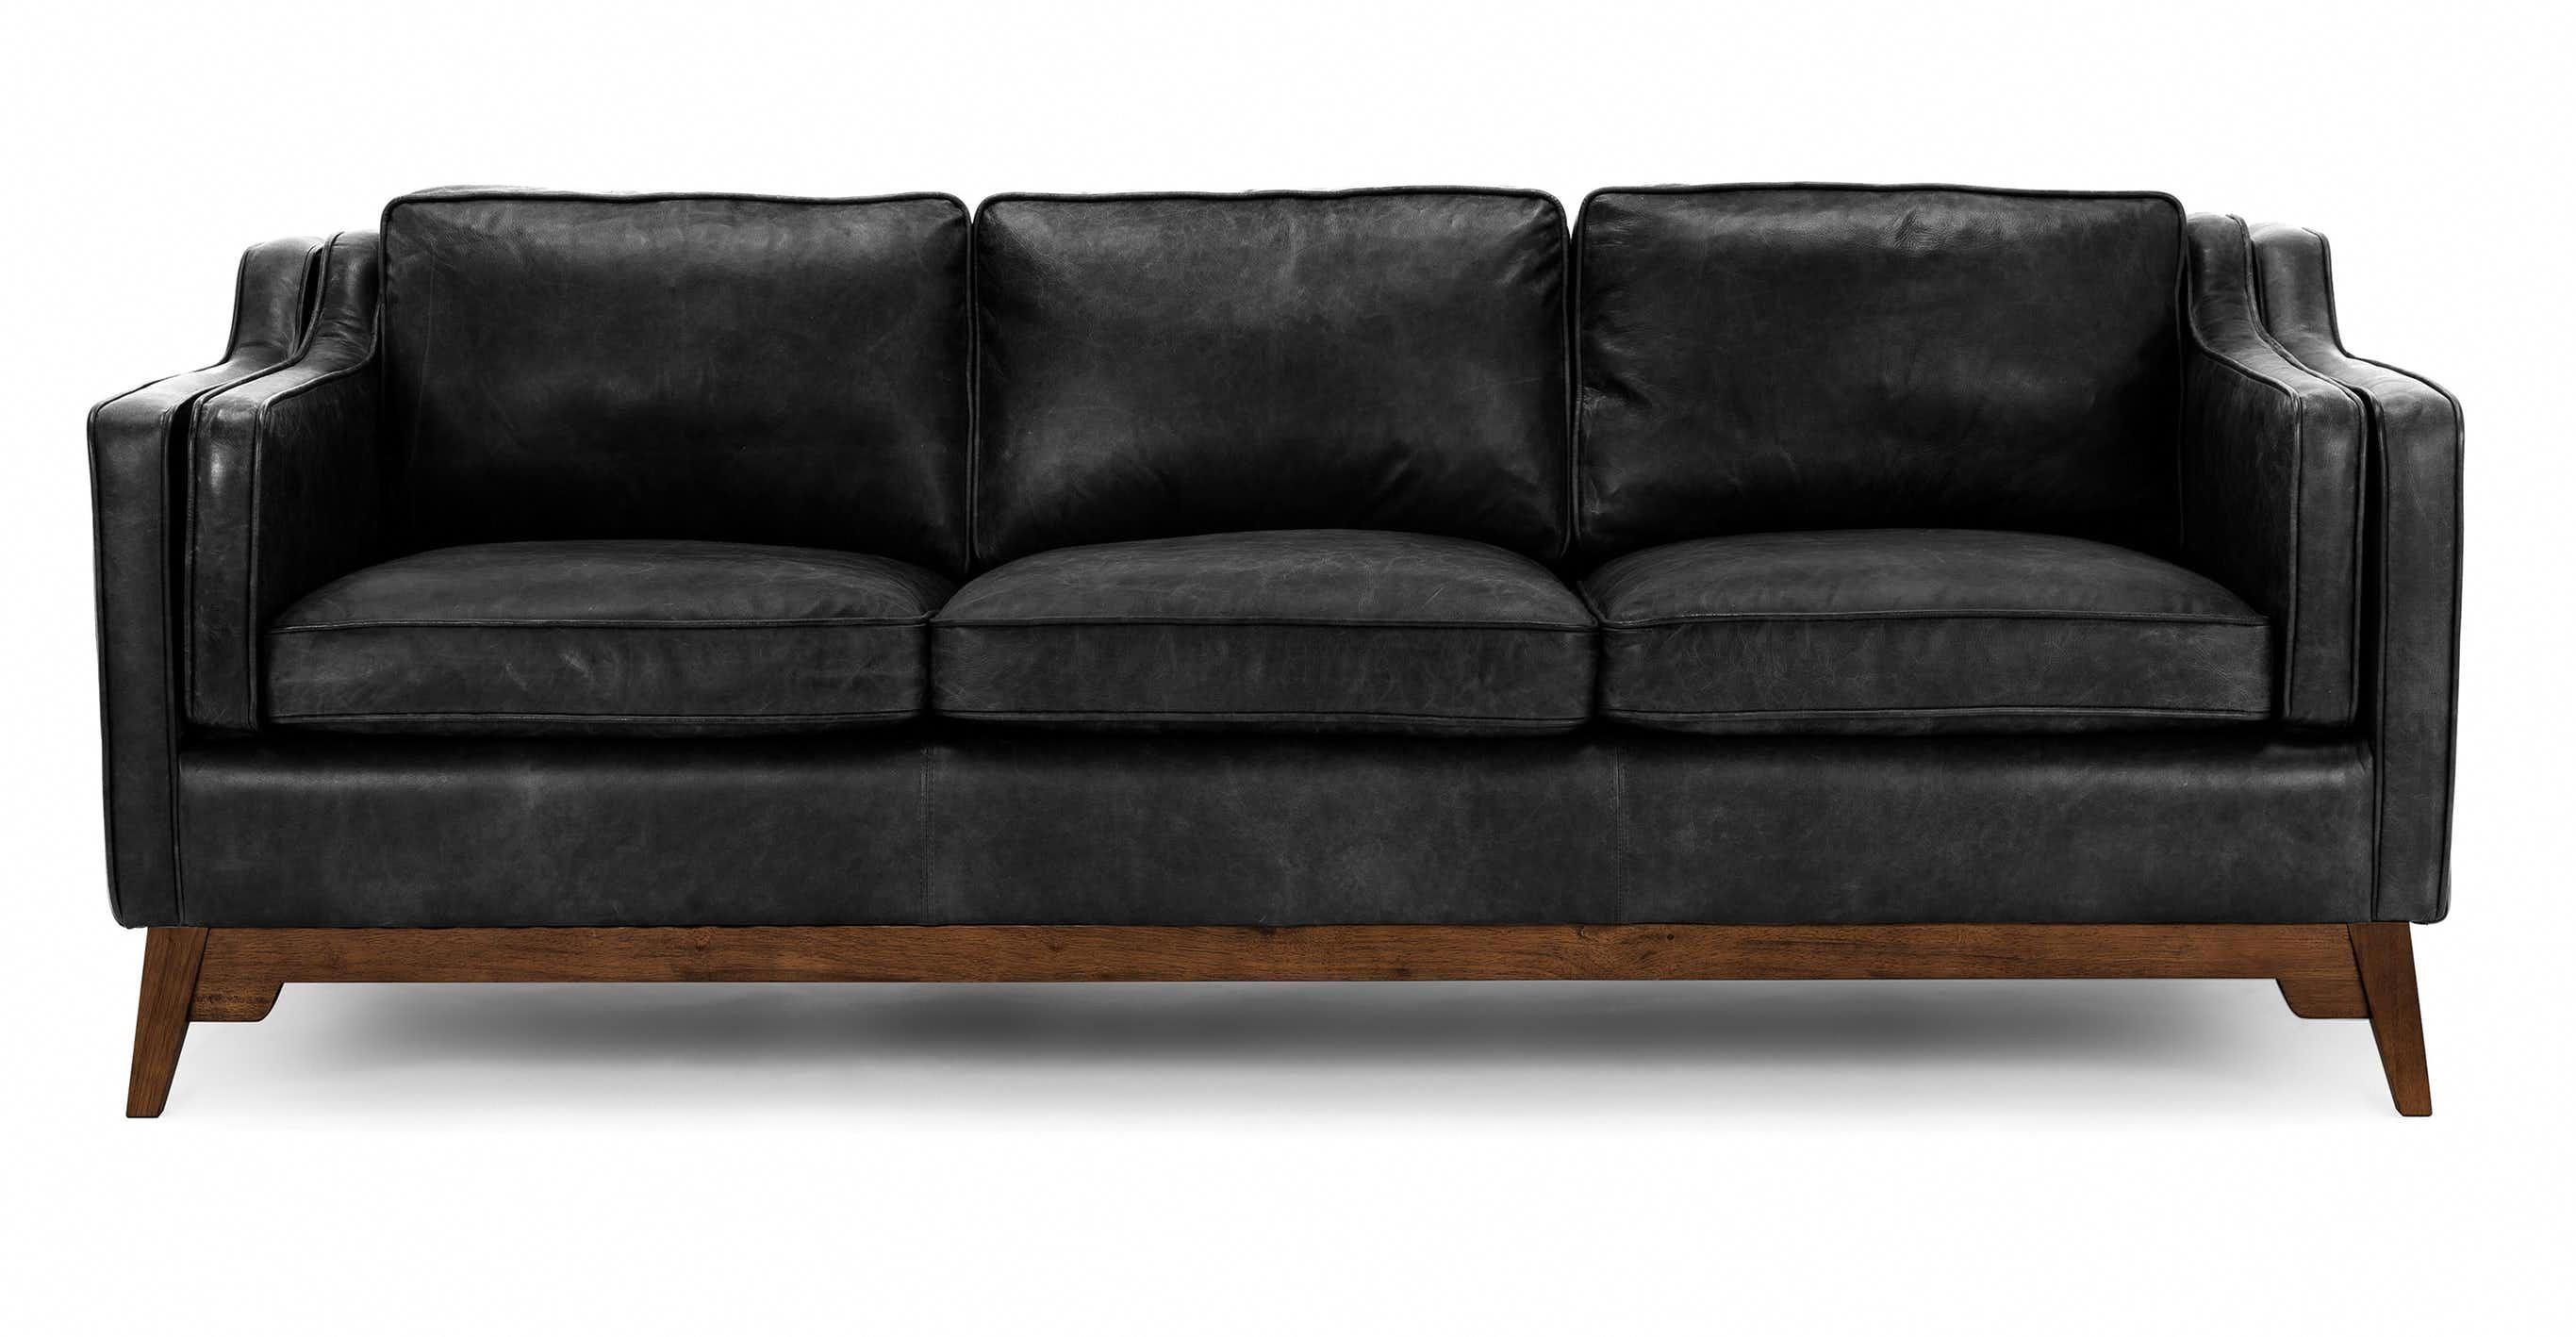 Worthington Oxford Black Sofa Black Sofa Brown Living Room Decor Brown Leather Sofa